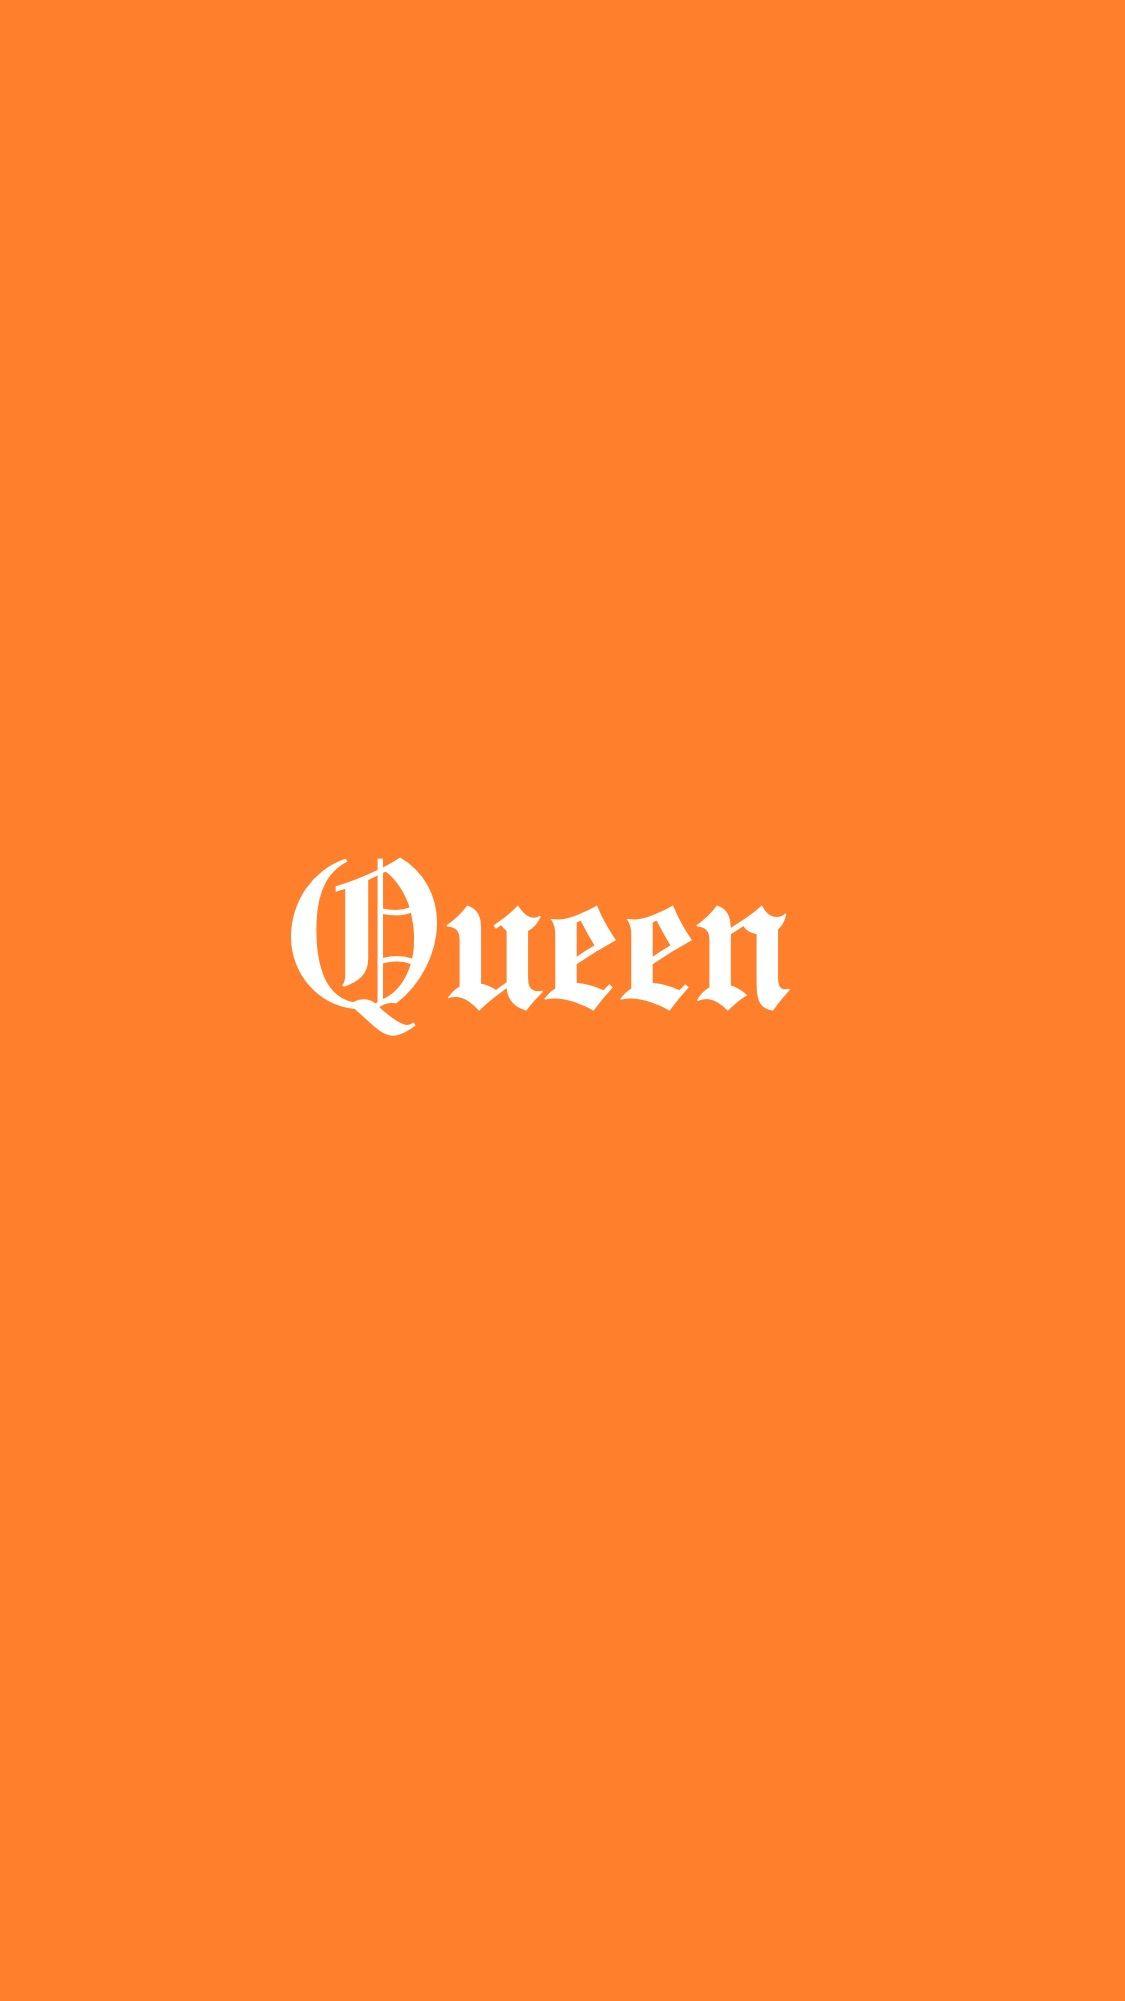 Pin By Abigail Moline On Orange Aesthetic Orange Aesthetic Orange Wallpaper Aesthetic Iphone Wallpaper